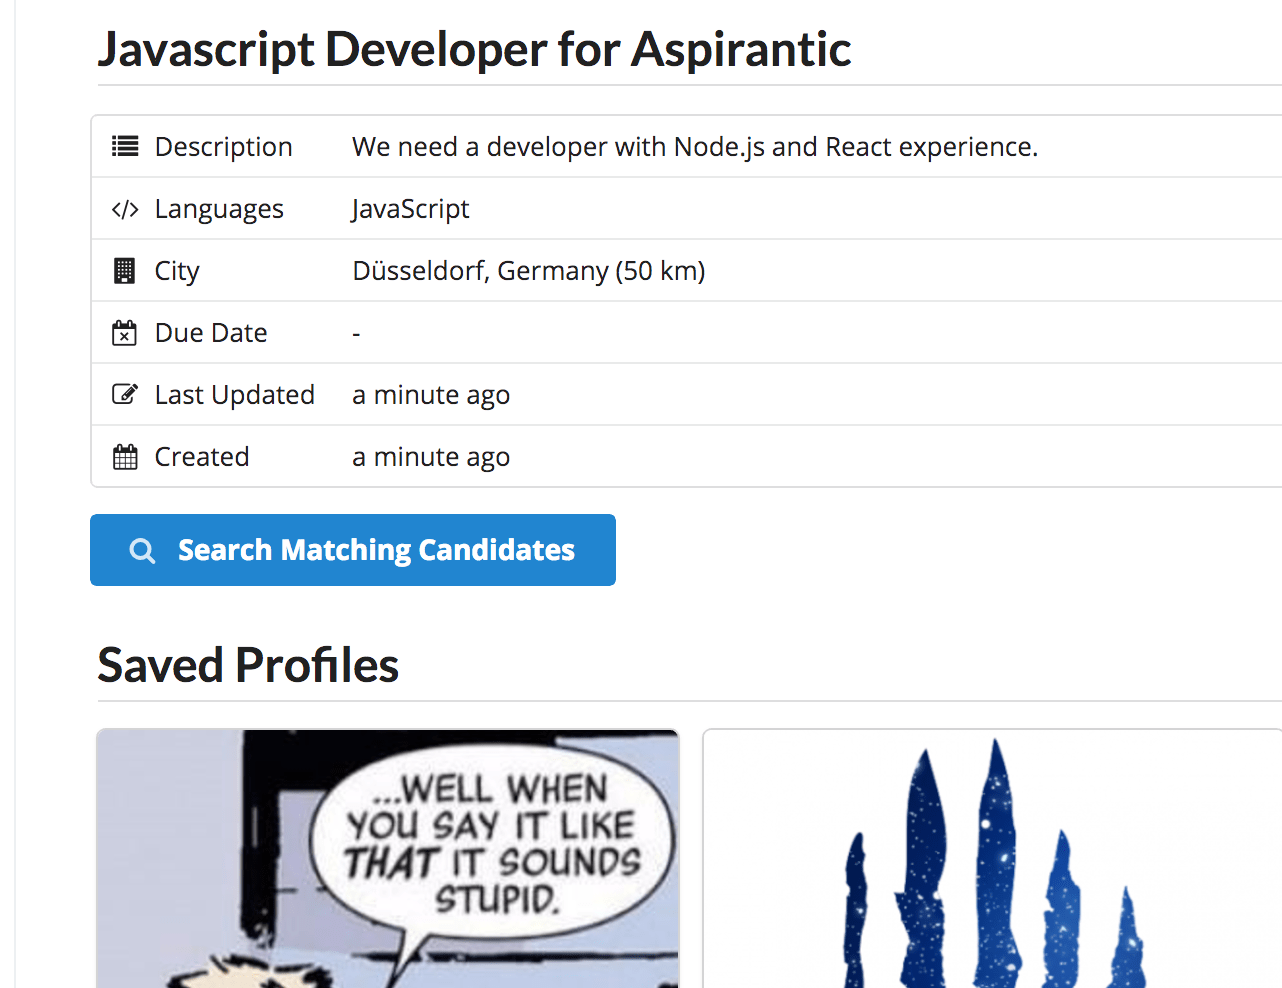 Aspirantic Profiles